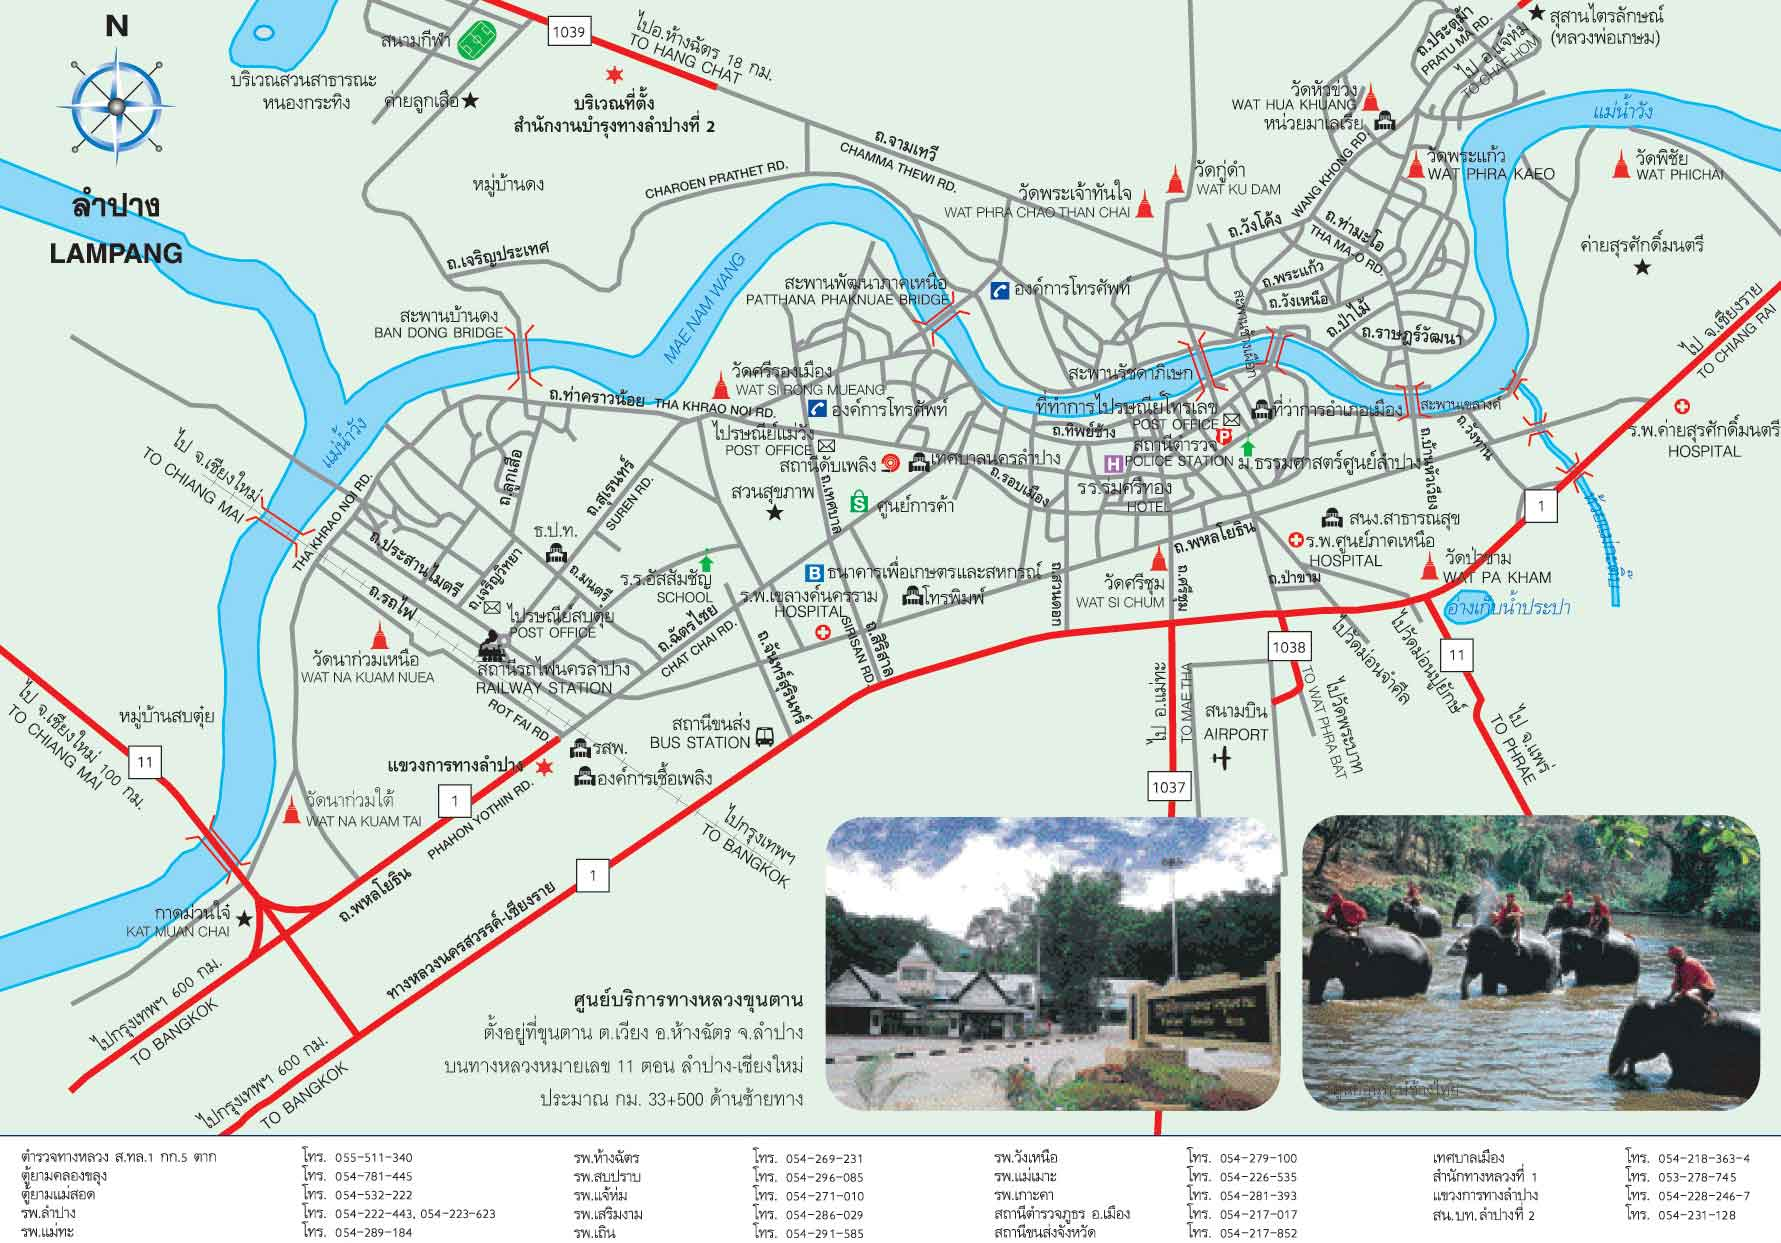 Lampang maps